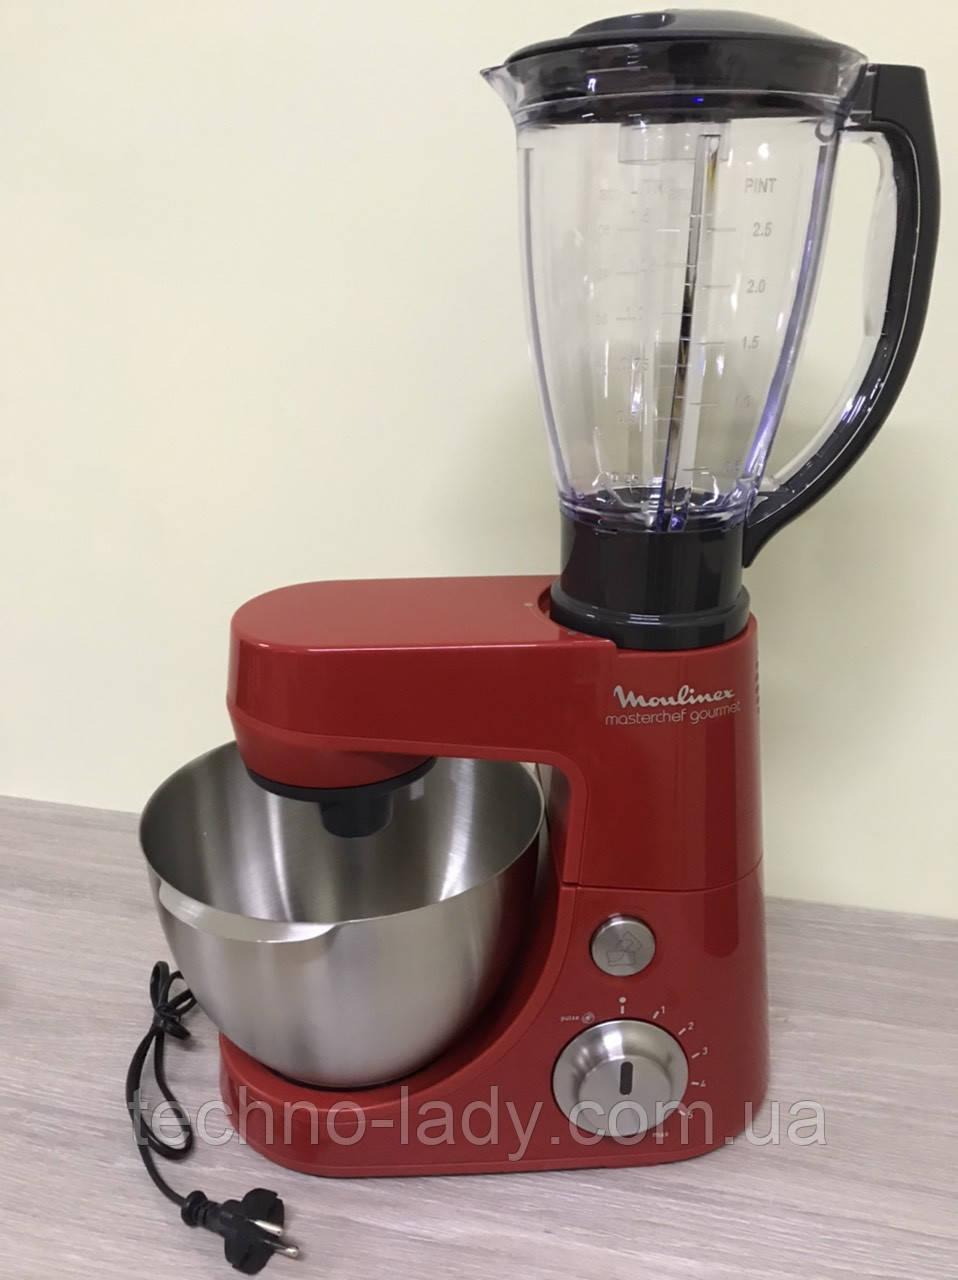 Кухонный комбайн, тестомес, блендер Moulinex QA408GB1